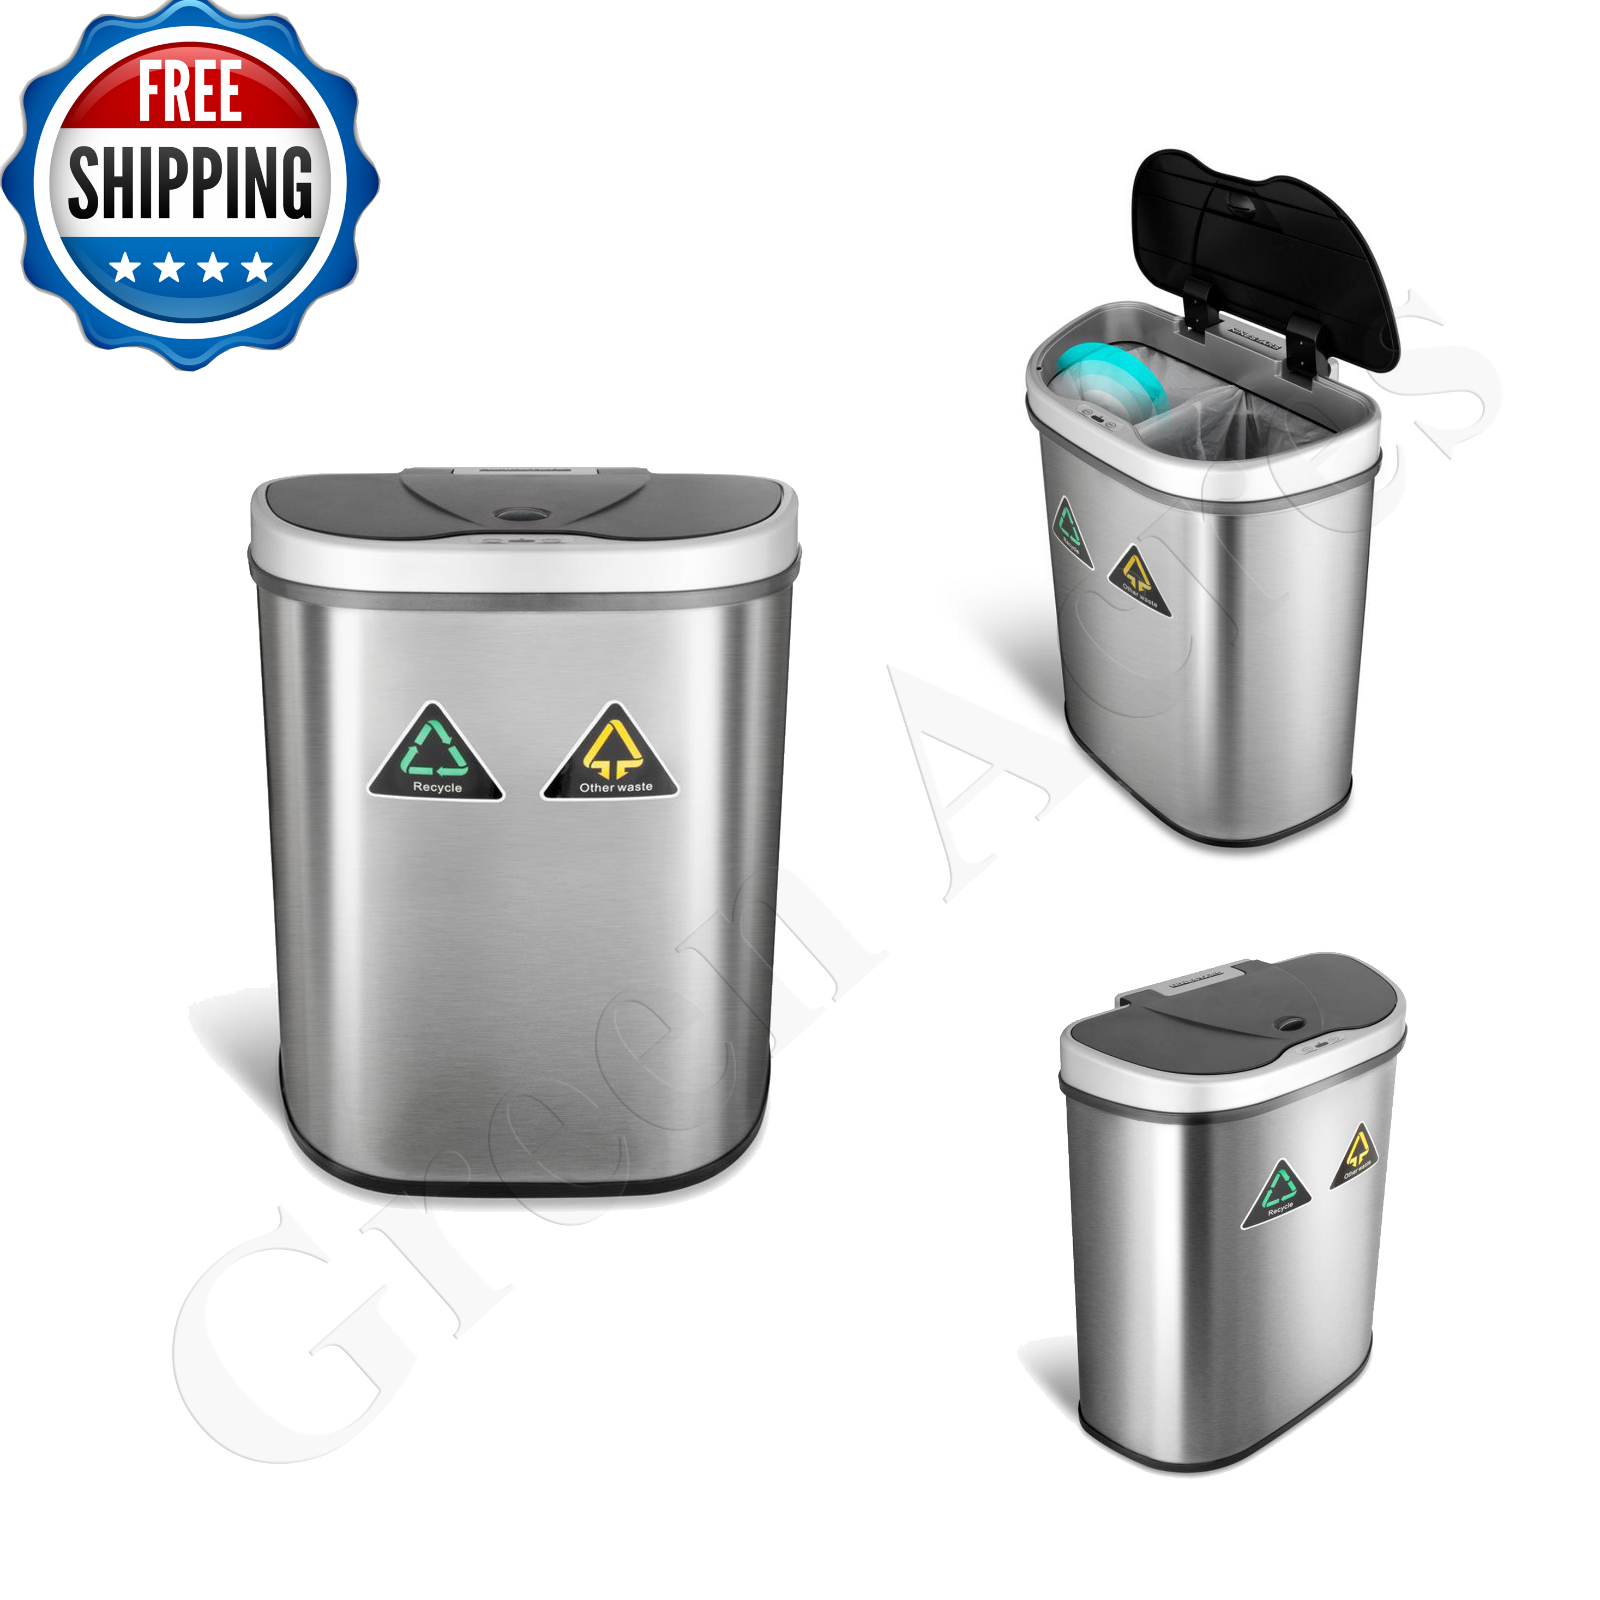 Https Ift Tt 33itjoc Trash Cans Ideas Of Trash Cans Trashcans Trash Trash Cans Kitchen Trash Cans Canning